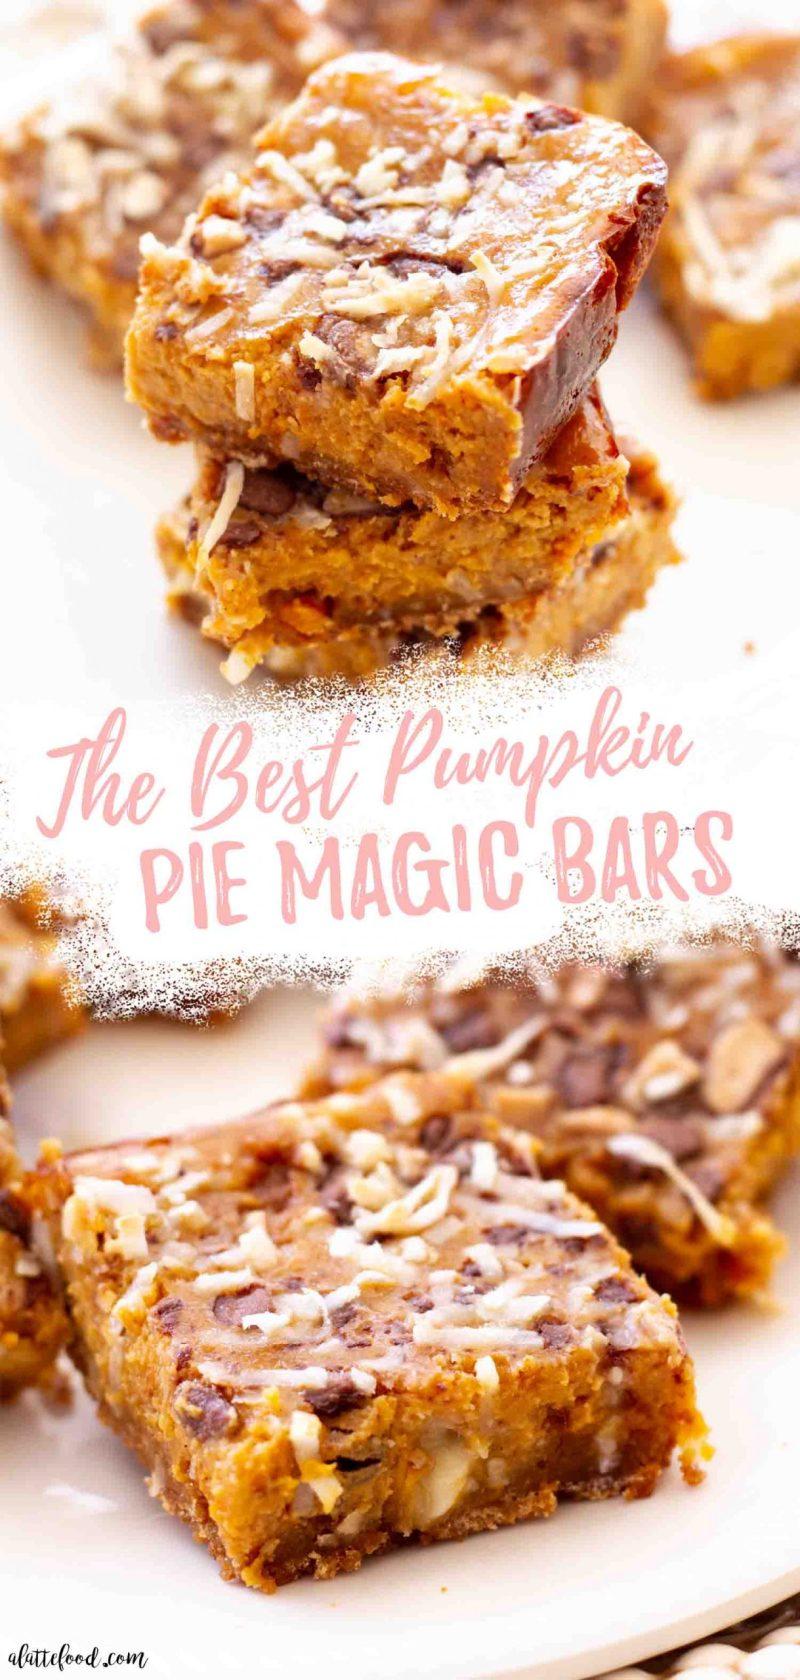 Pumpkin Pie Seven Layer Bars on serving dish collage